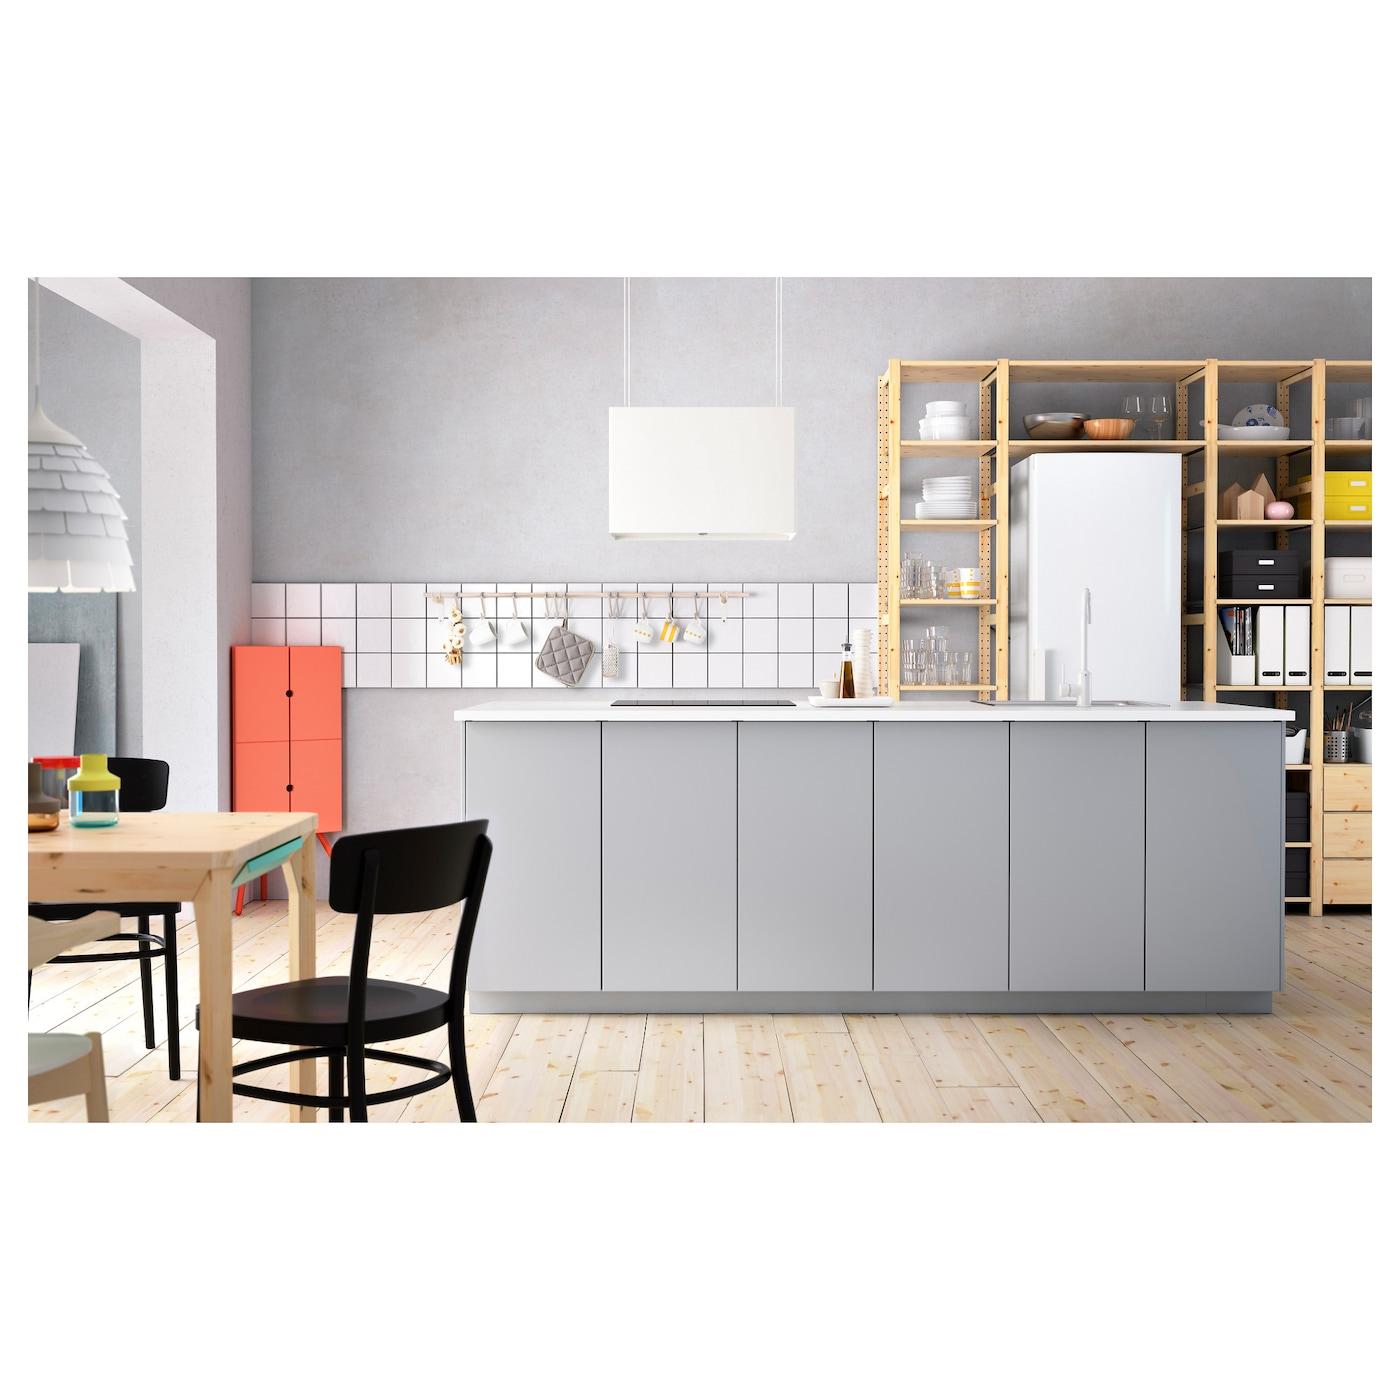 veddinge door grey 40x80 cm ikea. Black Bedroom Furniture Sets. Home Design Ideas